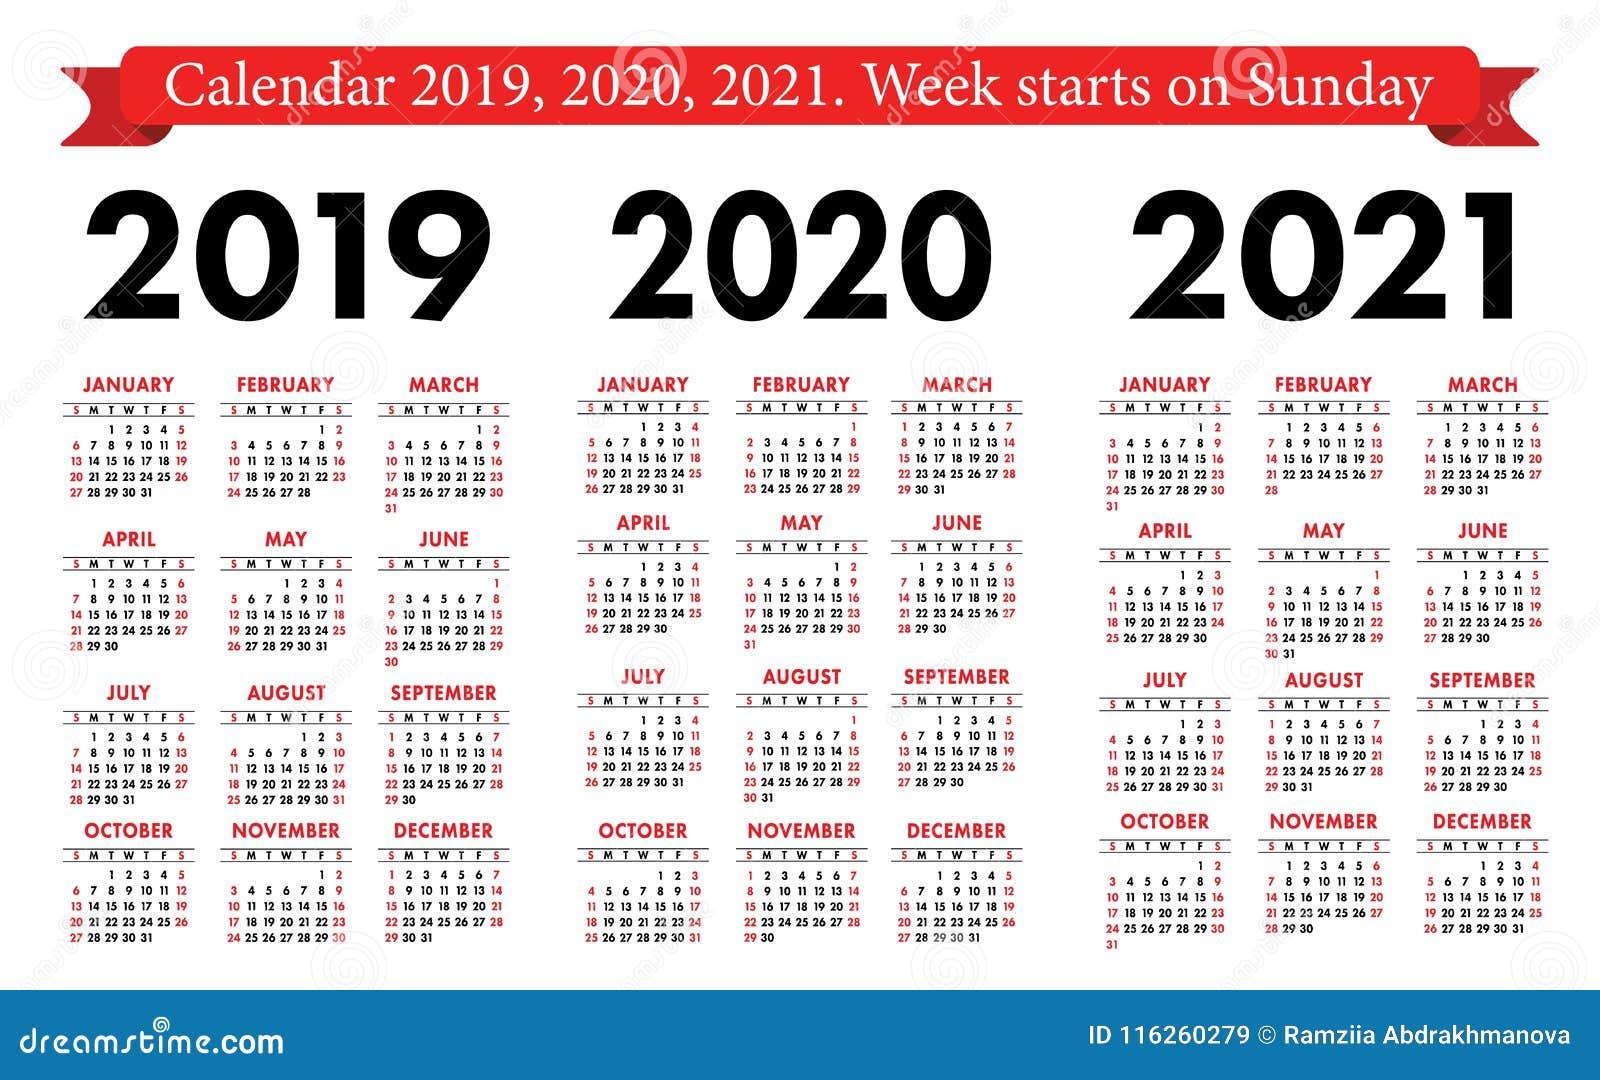 Calendrier 2021 Avec Semaine.Calendrier 2019 2020 De Poche Ensemble 2021 Calibre Simple